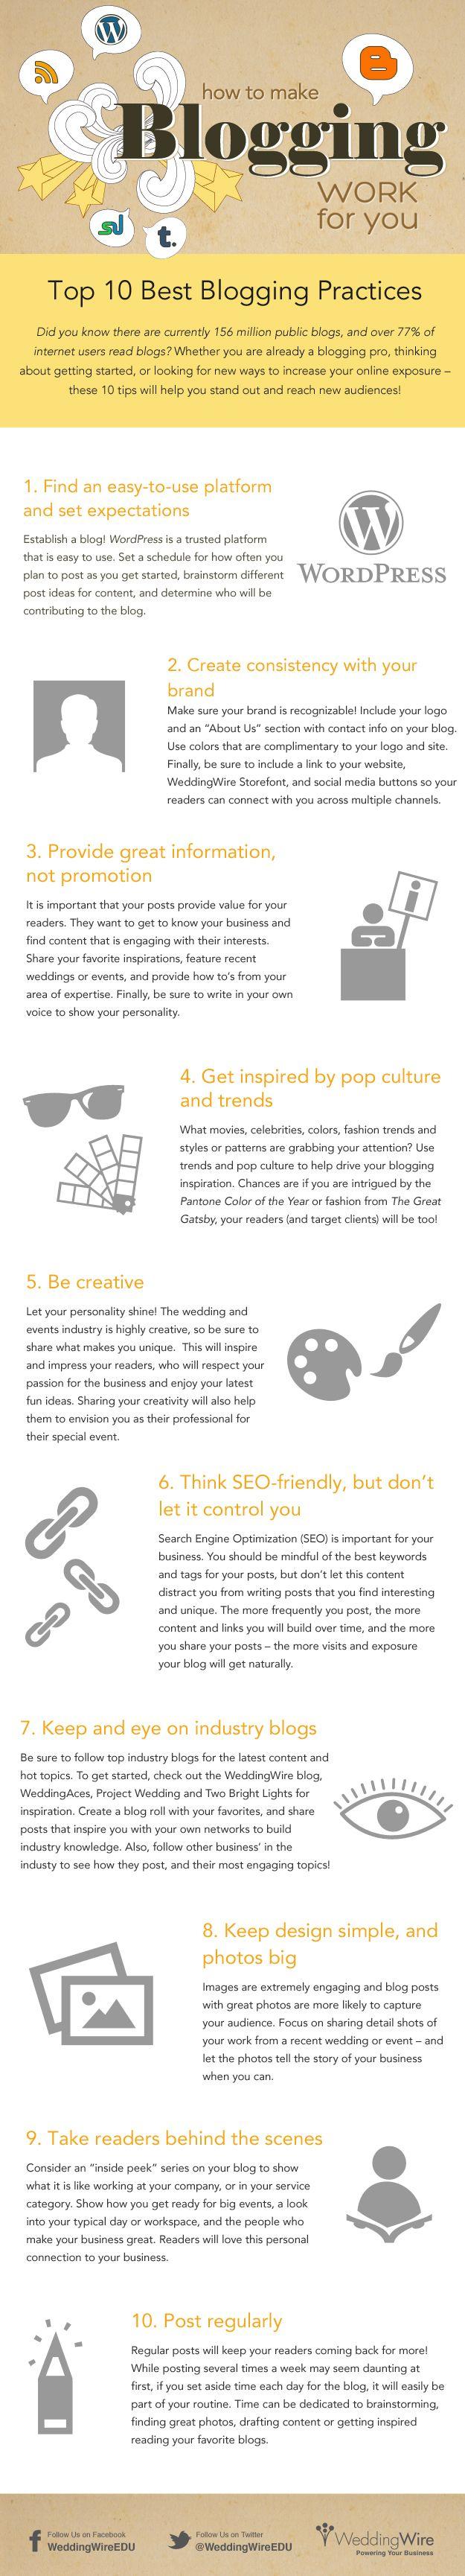 10 Best Blogging Practices [INFOGRAPHIC] - Digital Information World | #TheMarketingAutomationAlert